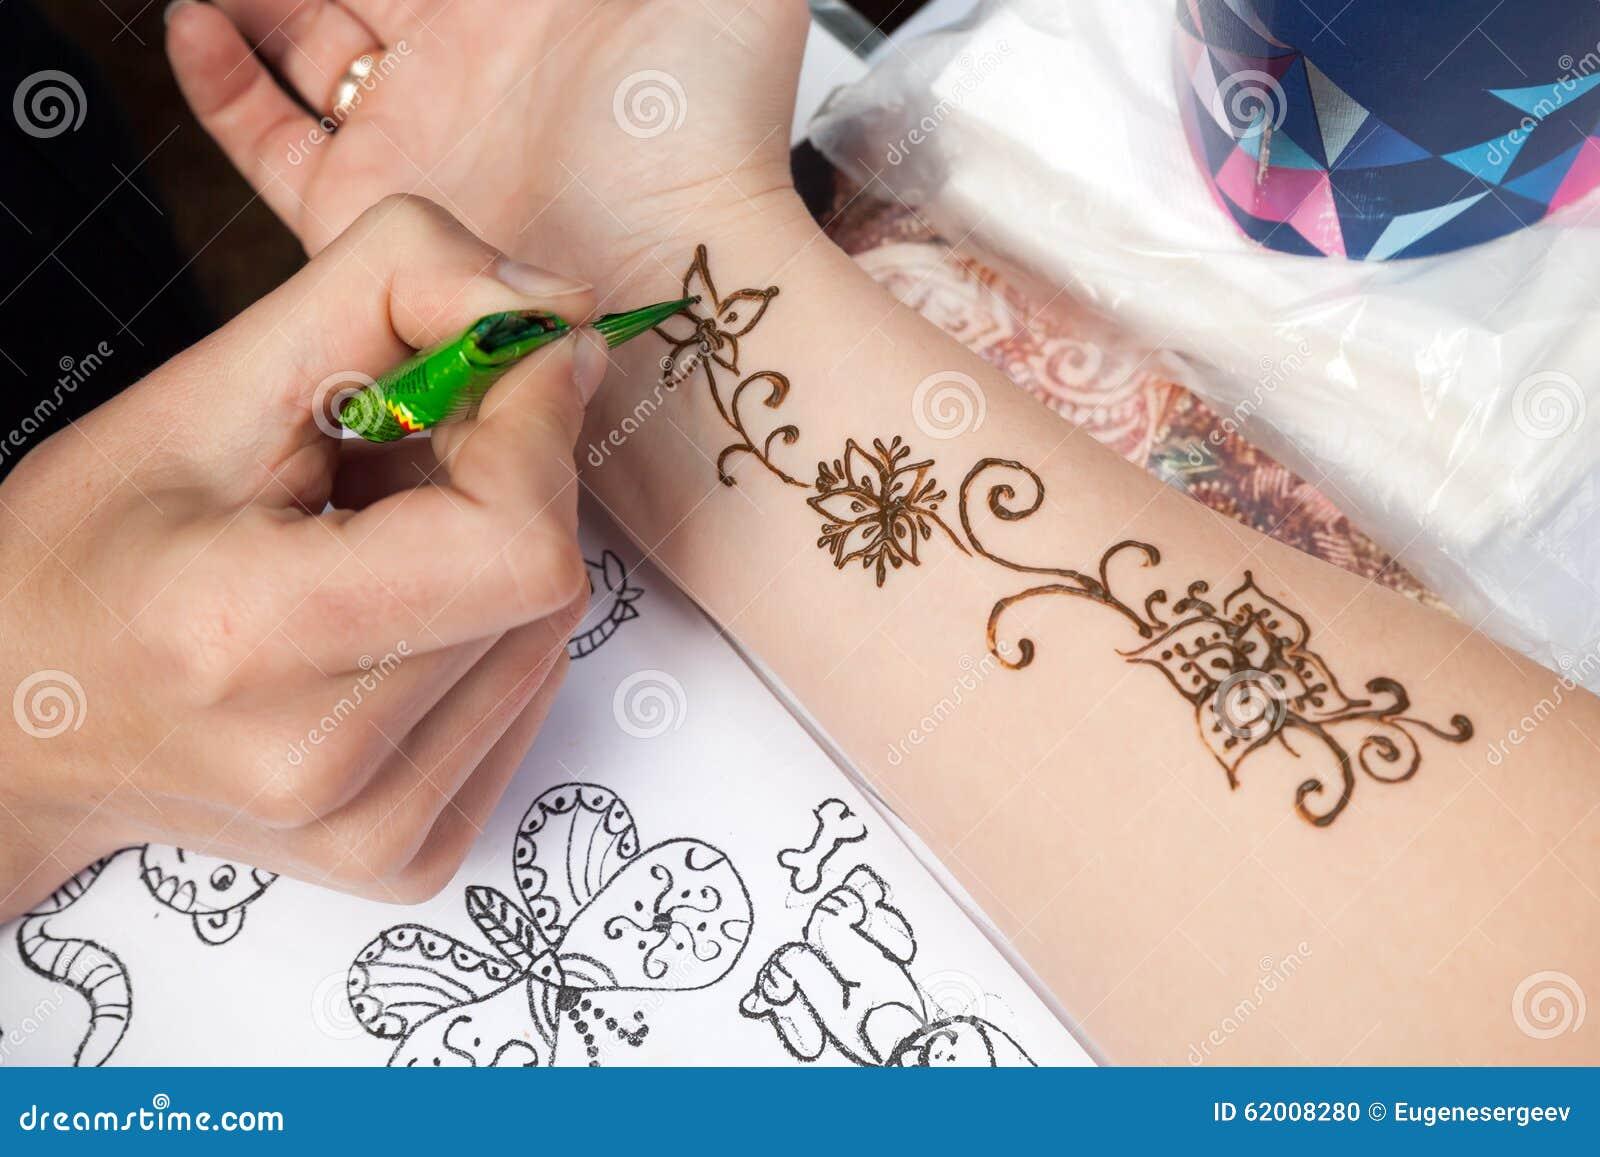 Mehndi Hands Powerpoint : Mehndi application on woman hand skin decoration editorial image